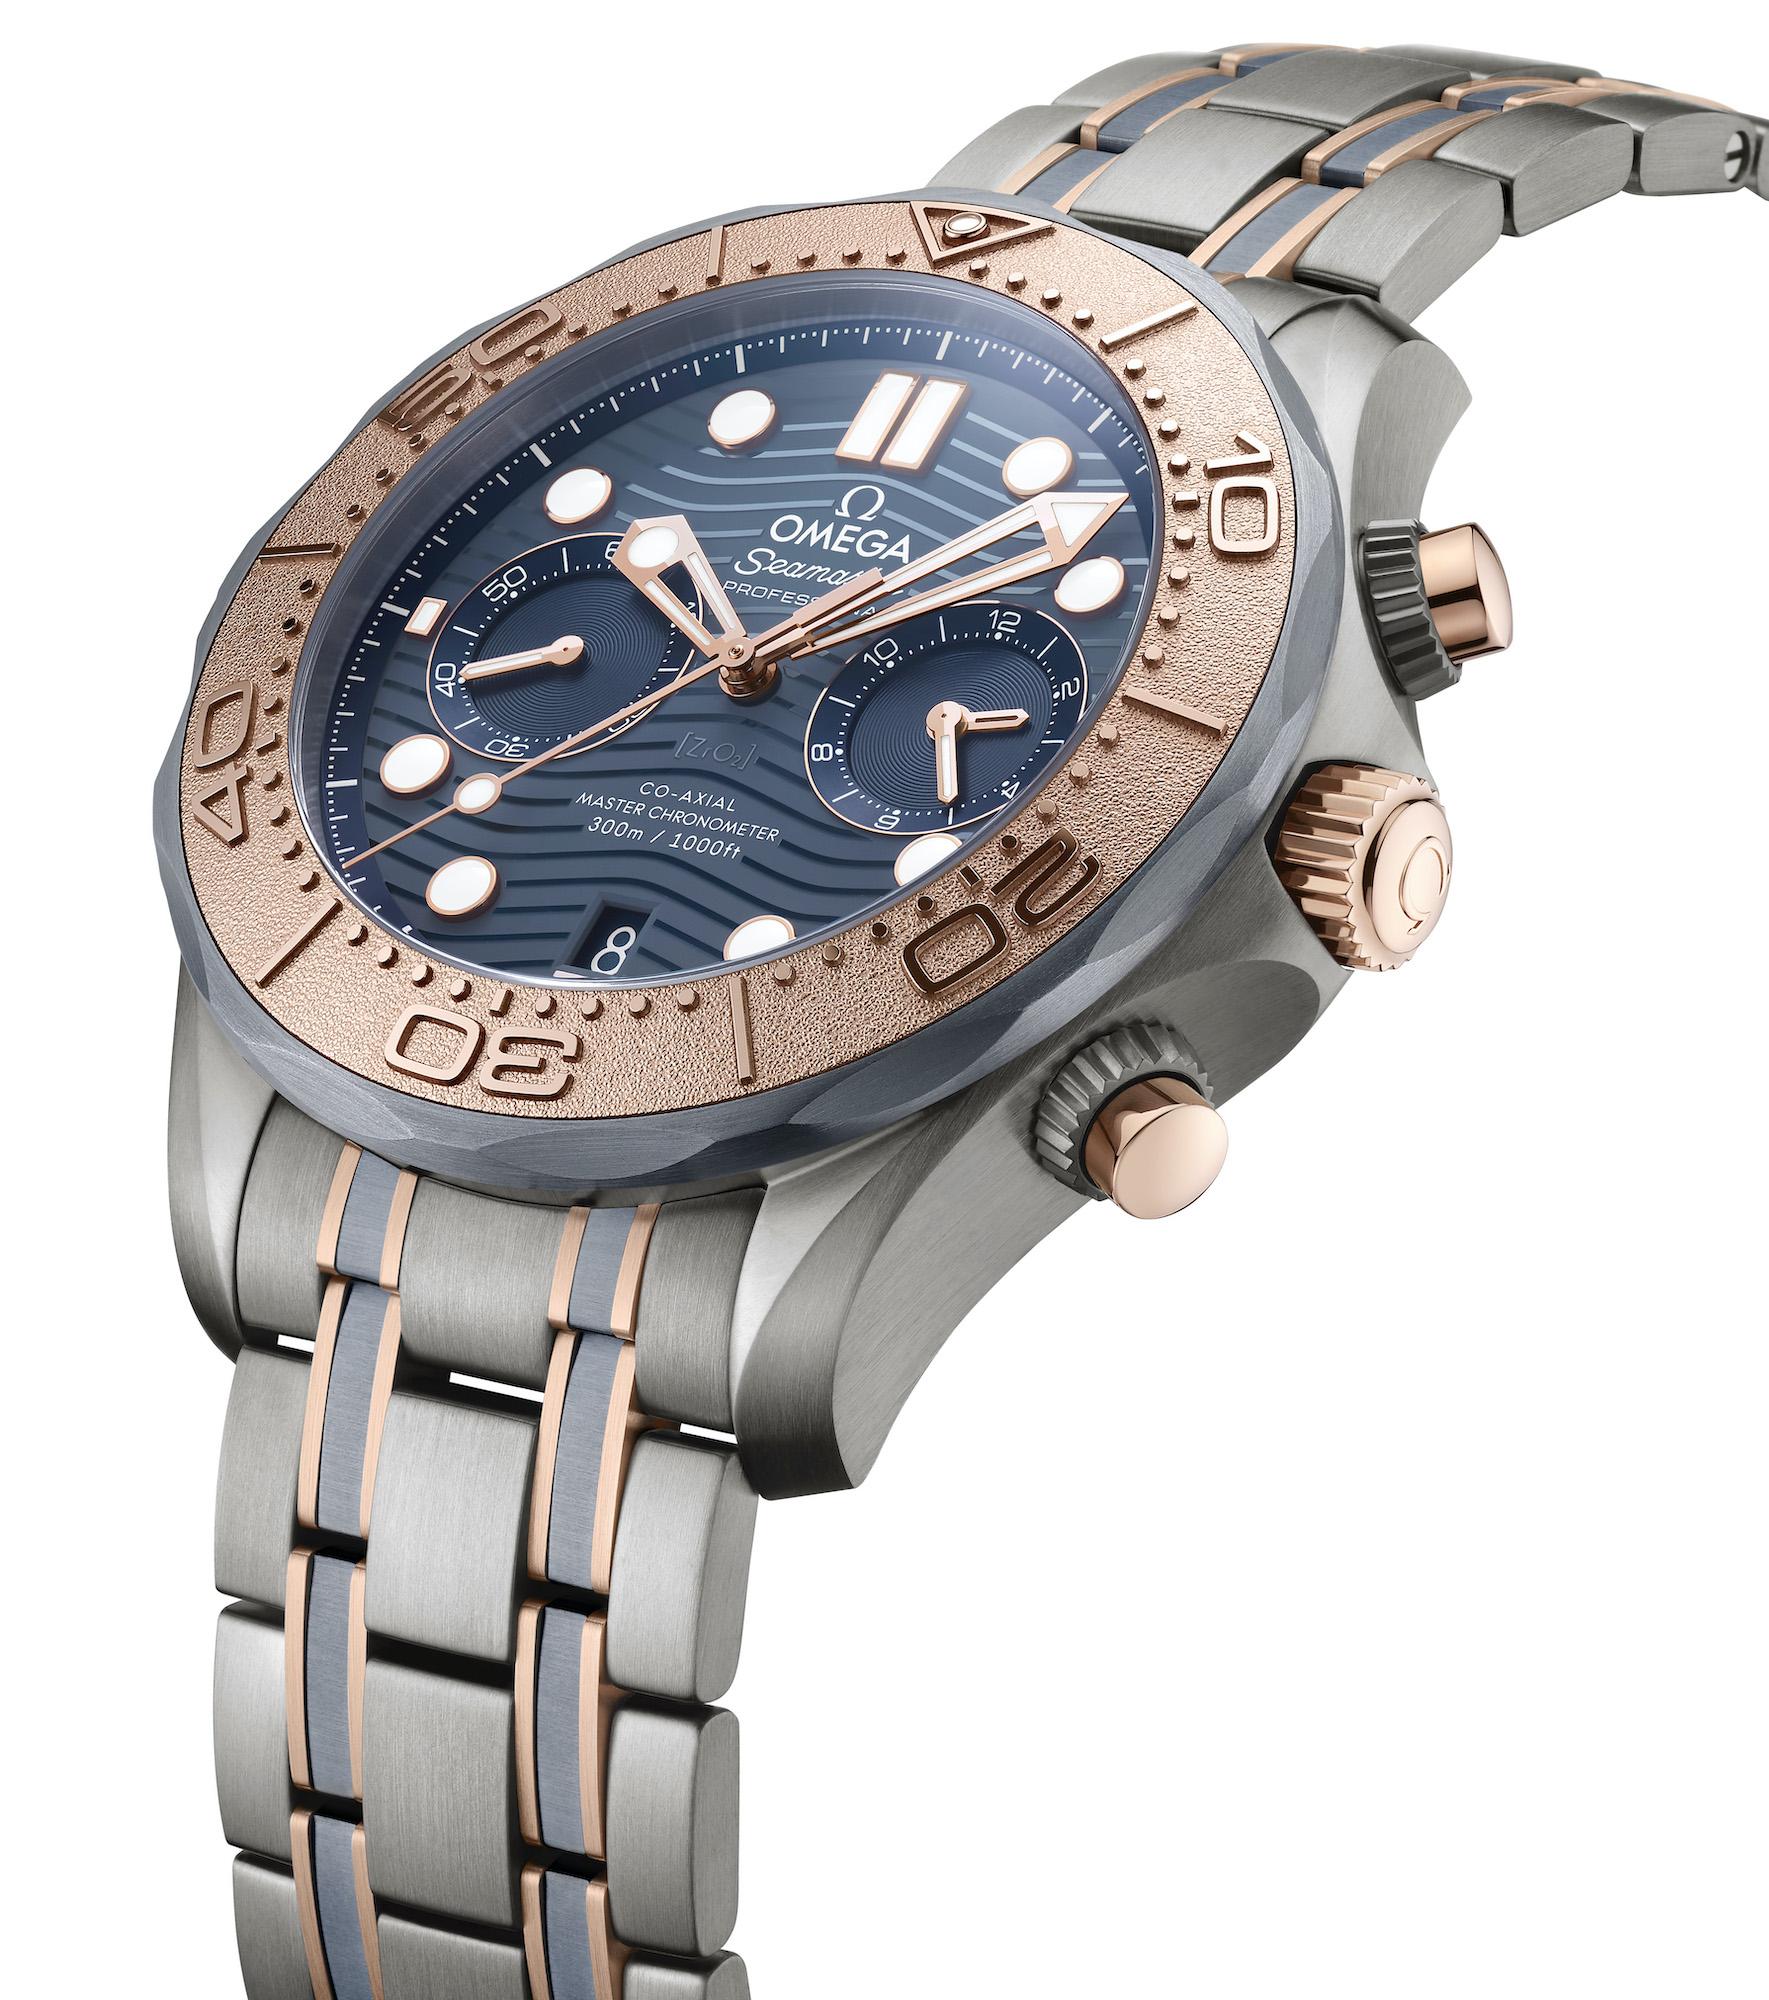 Omega Seamaster Diver 300M Chronograph oro titanio tantalio 210.60.44.51.03.001 2